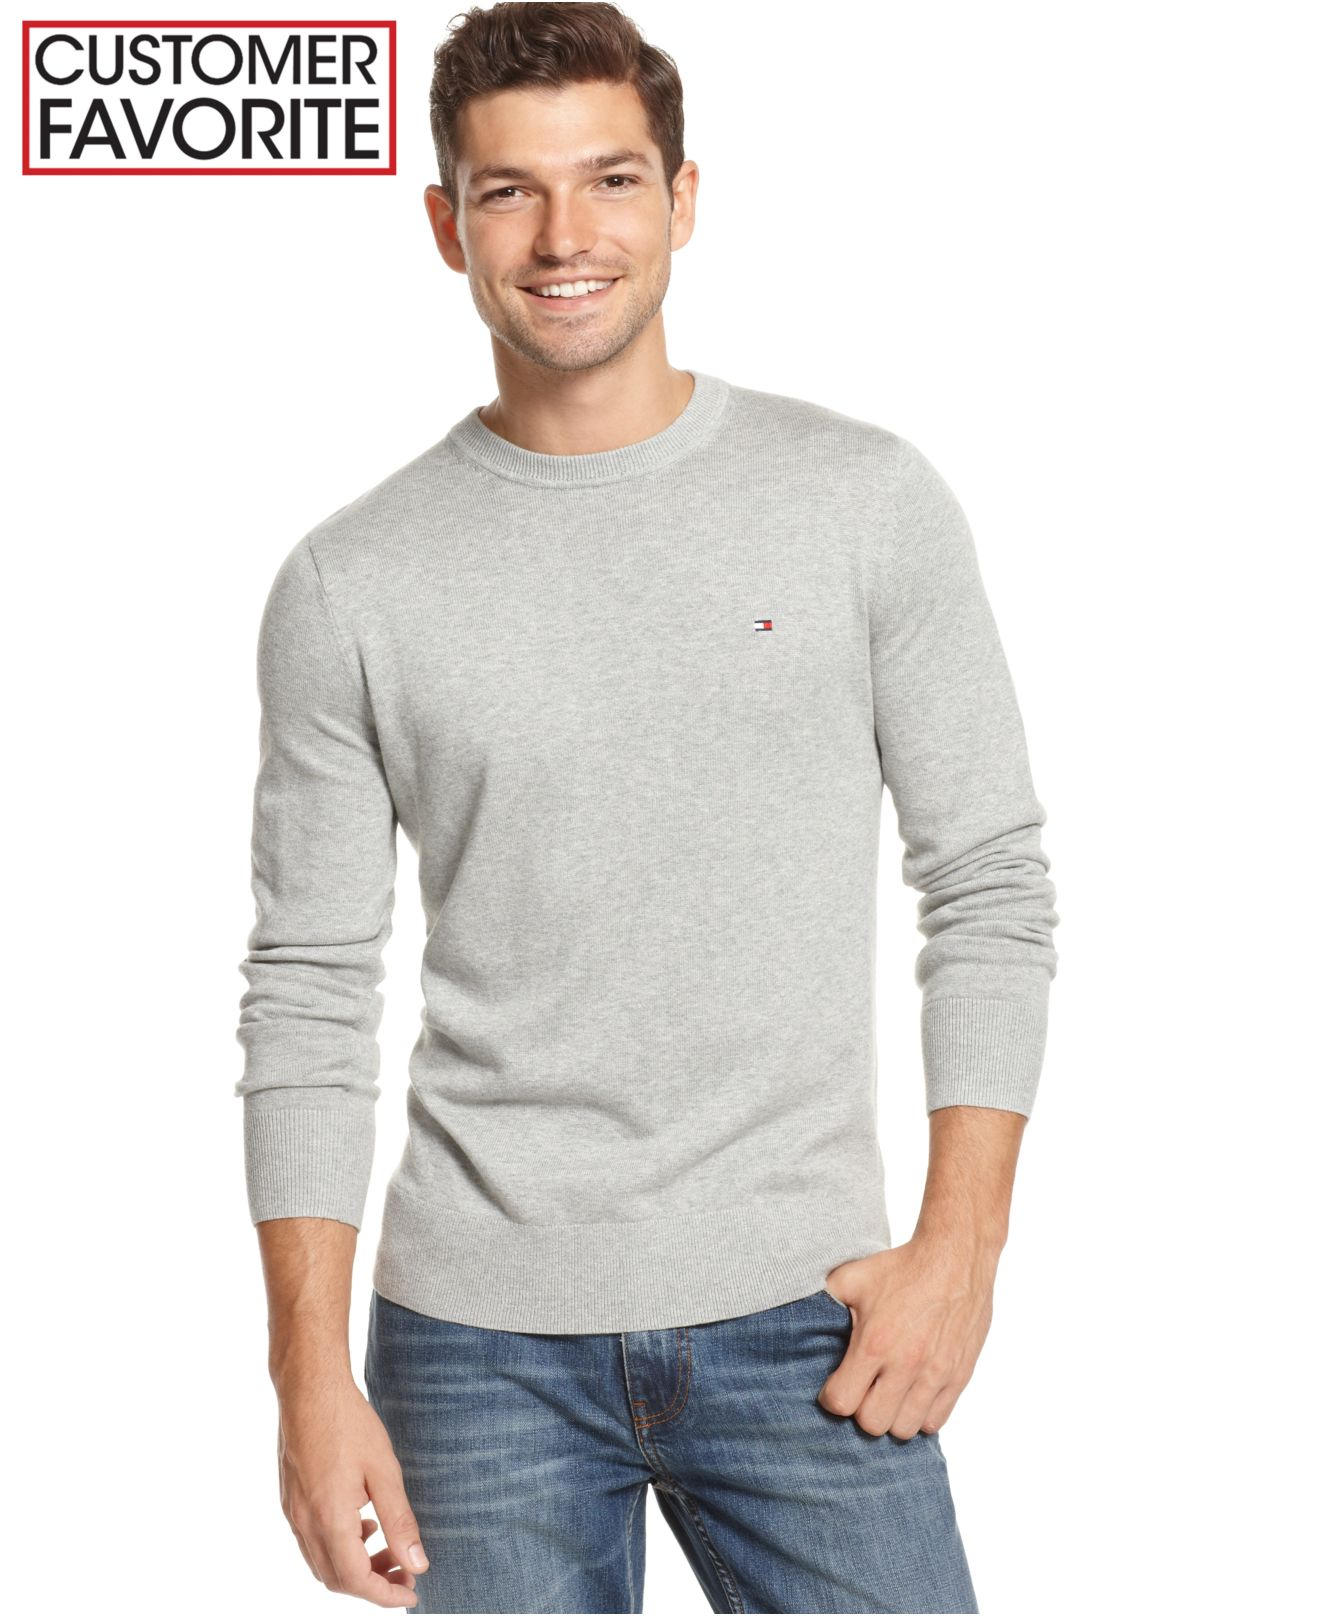 12c4cd59874b5 Tommy Hilfiger Mens Crew Neck Sweater - erva-cidreira.info